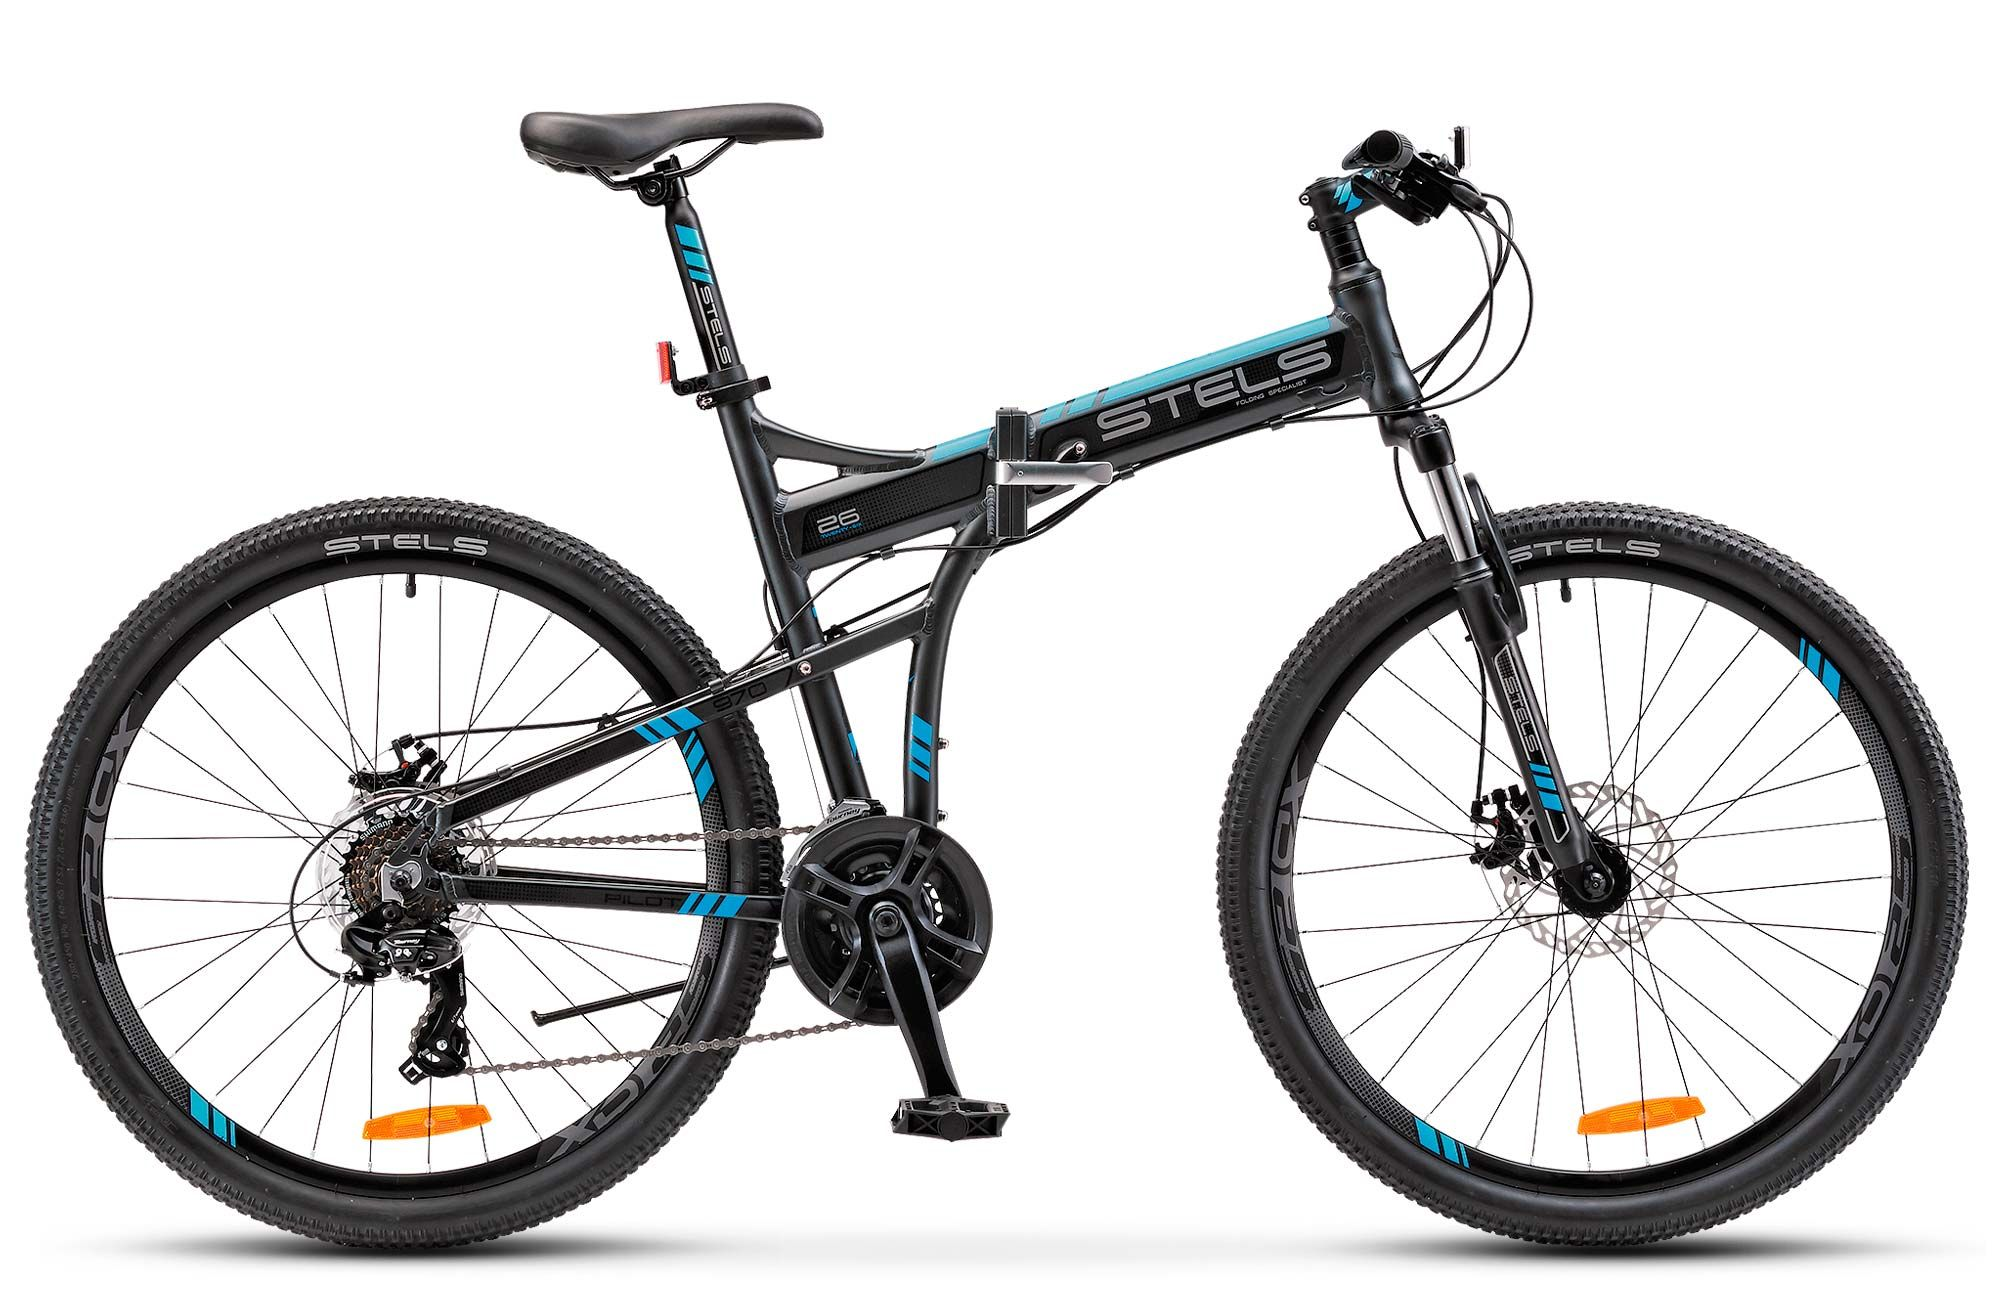 Велосипед Stels Pilot 970 MD 2017,  Складные  - артикул:278631